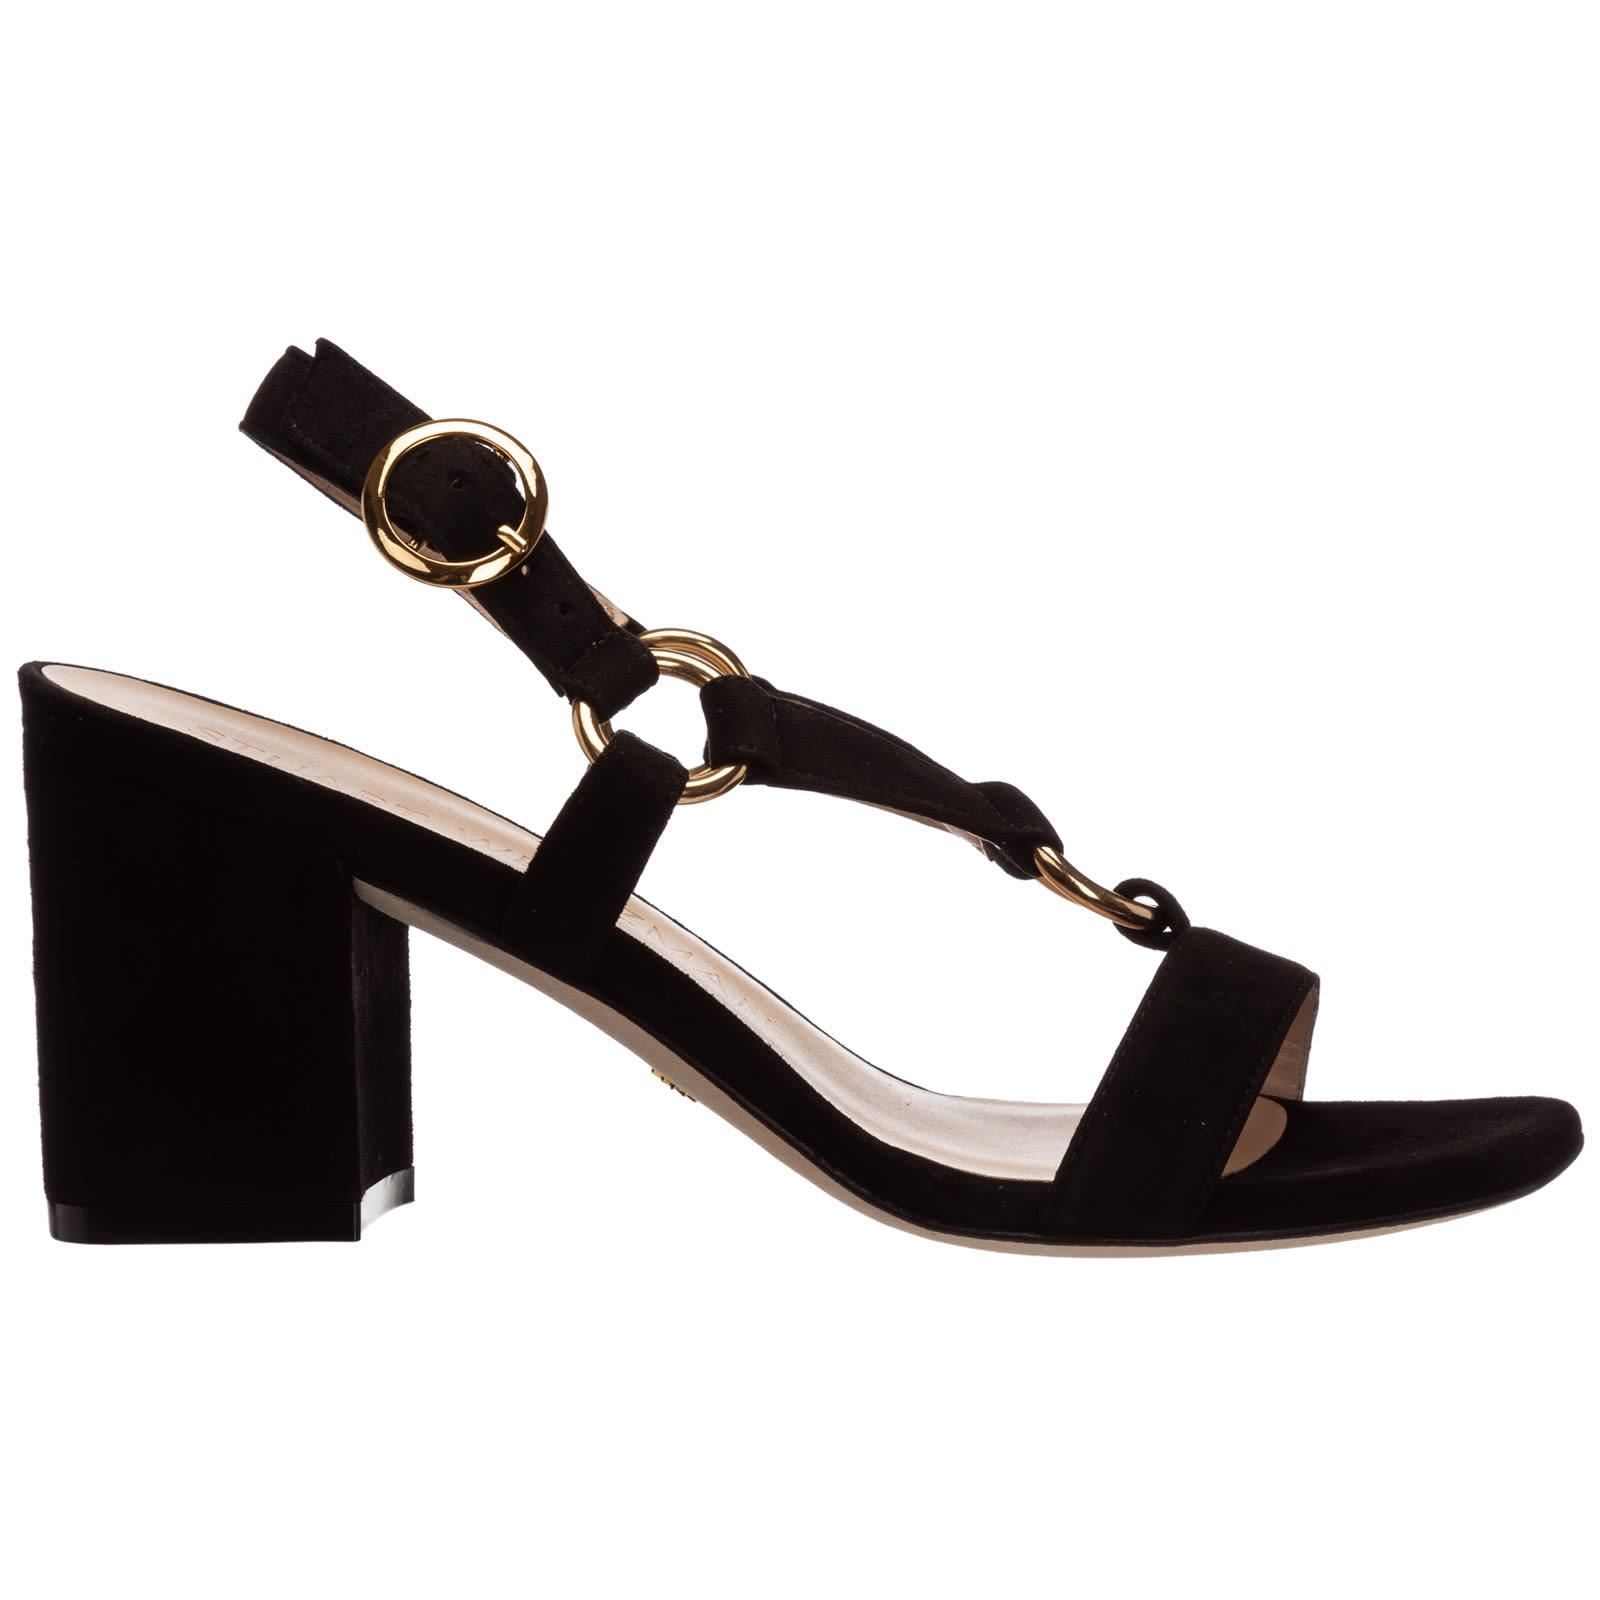 Stuart Weitzman Lolita Sandals